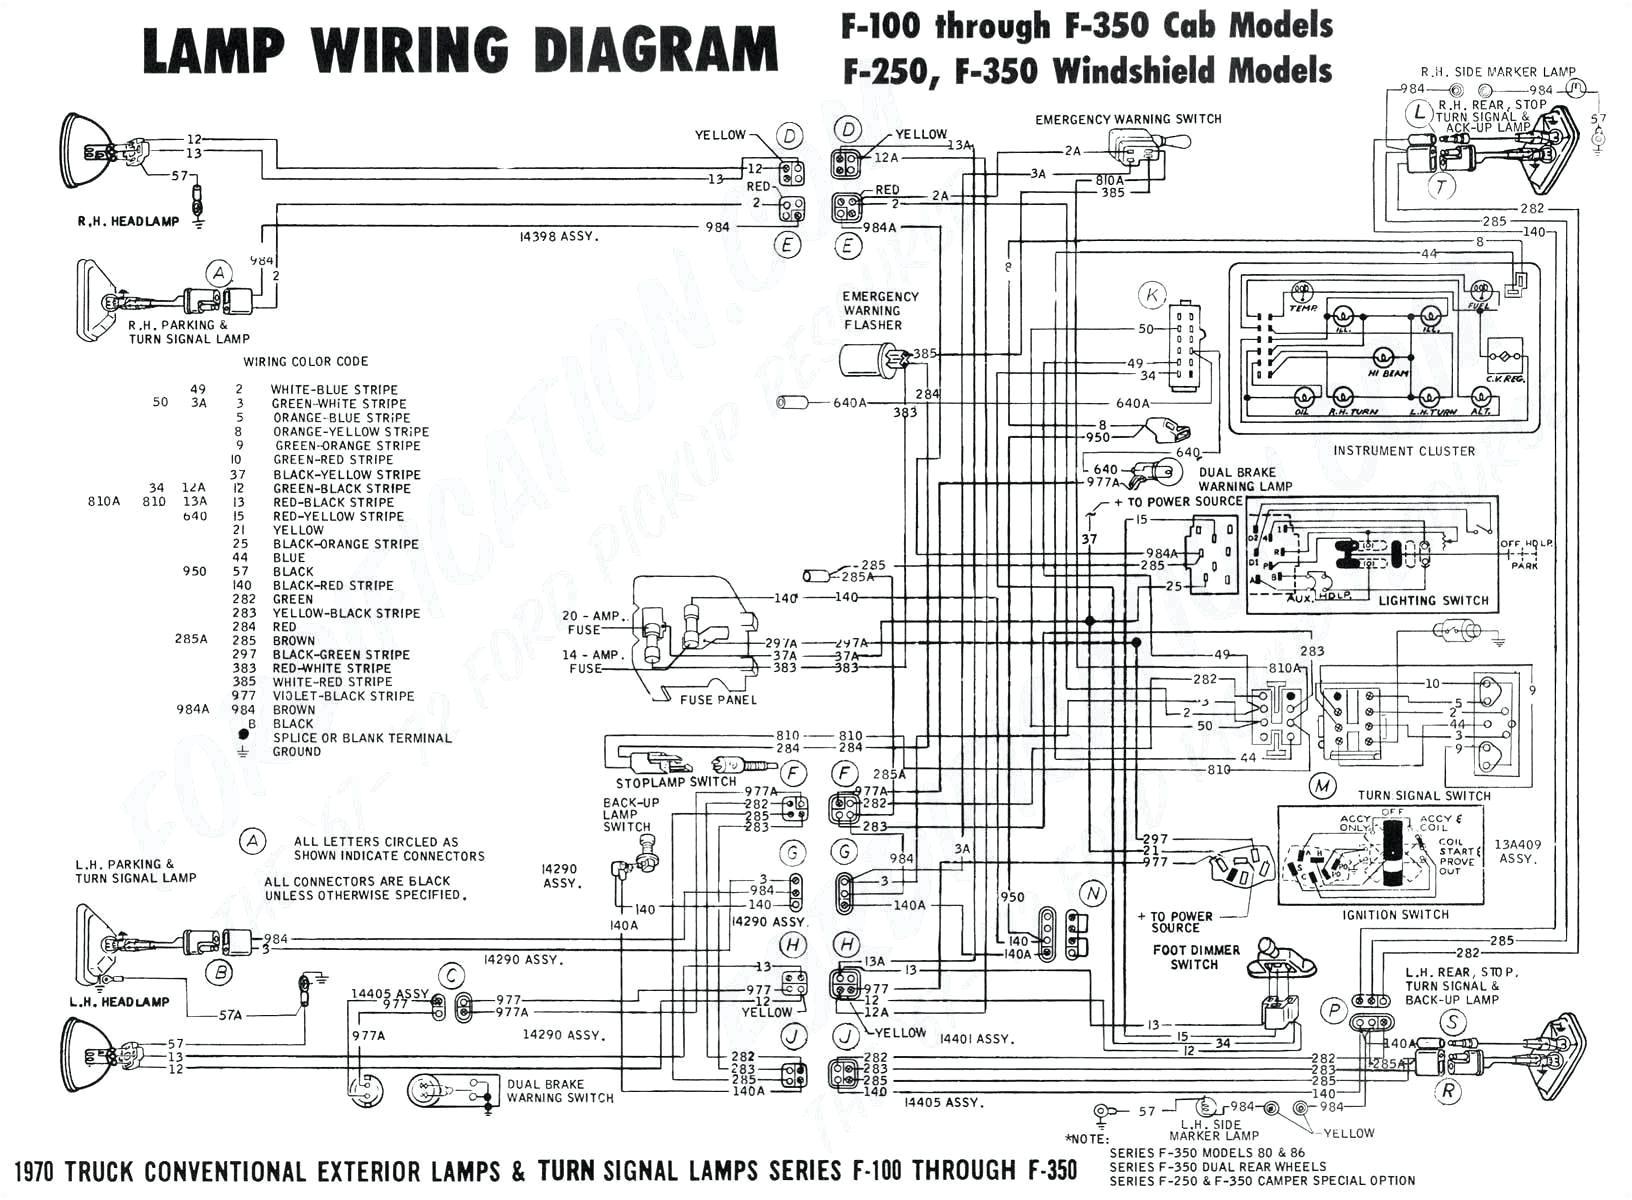 Chevrolet Steering Column Wiring Diagram 86 Chevy Steering Column Wiring Diagram Wiring Diagram Pos